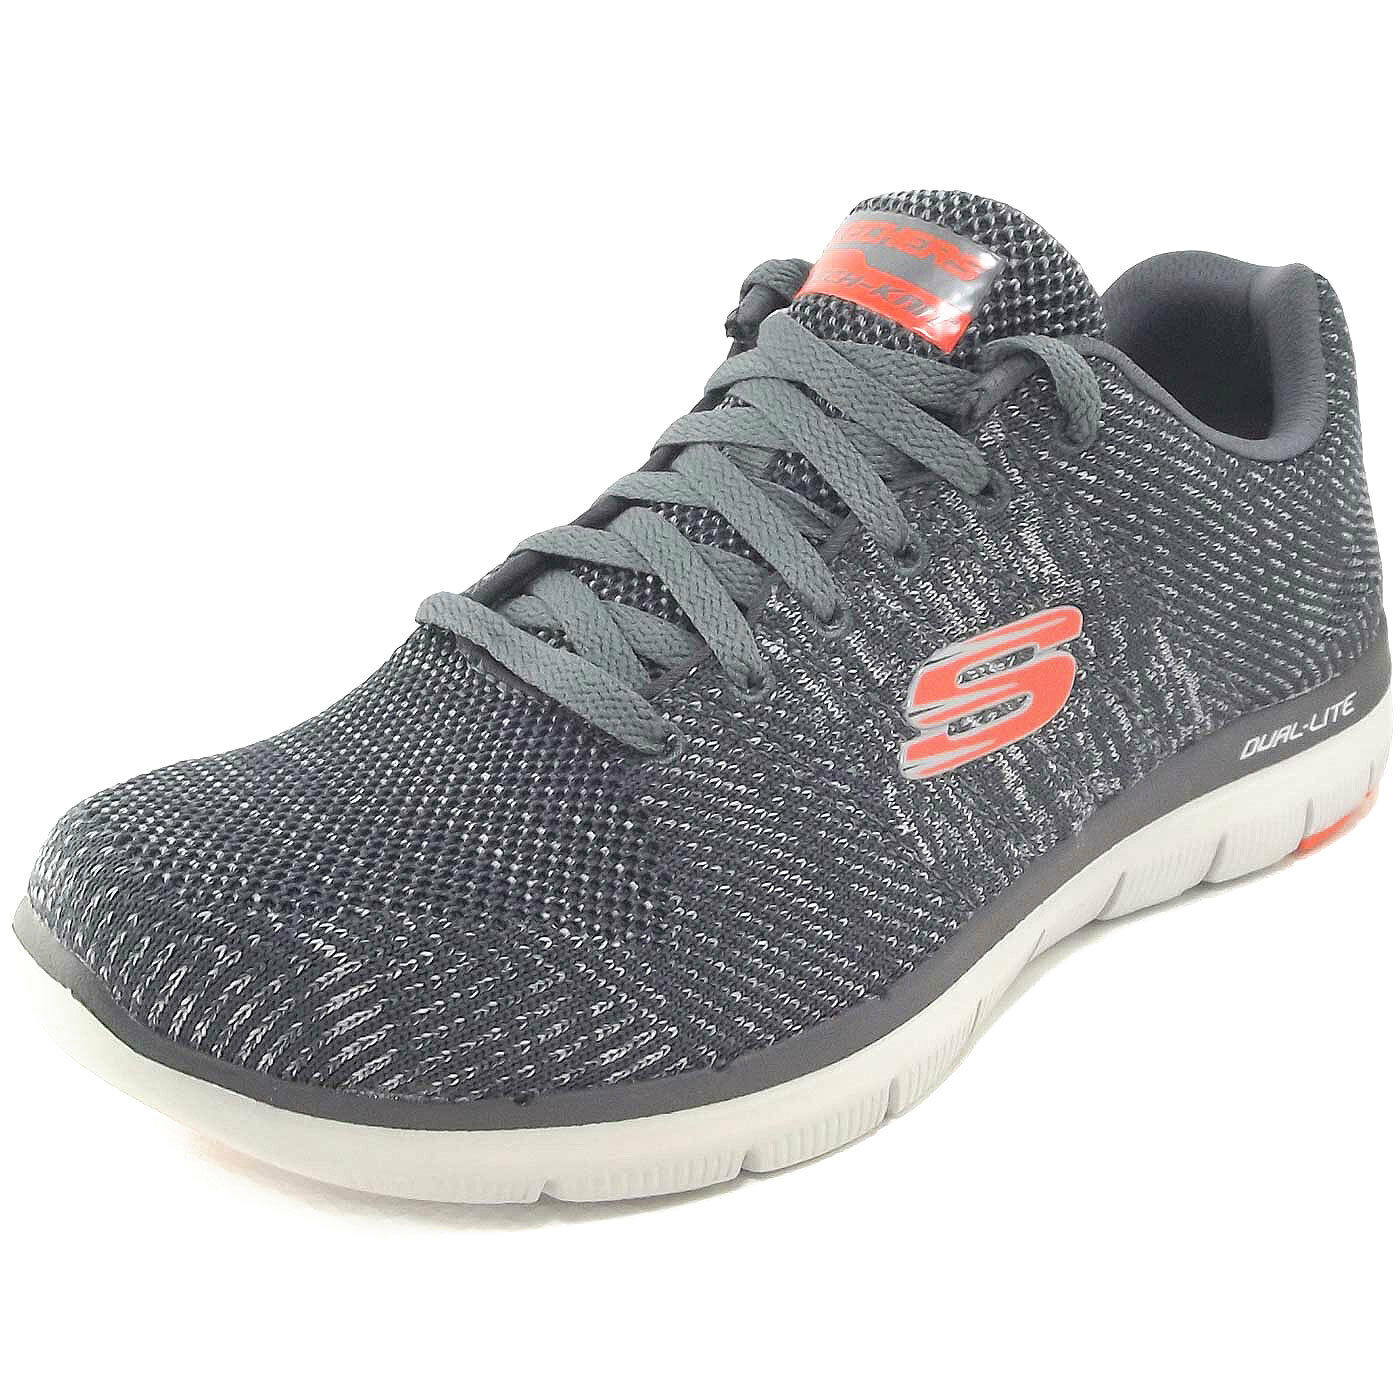 Skechers Flex Advantage 2.0 Missing Link Trainingszapatilla de deporte gris (charcoal naranja)